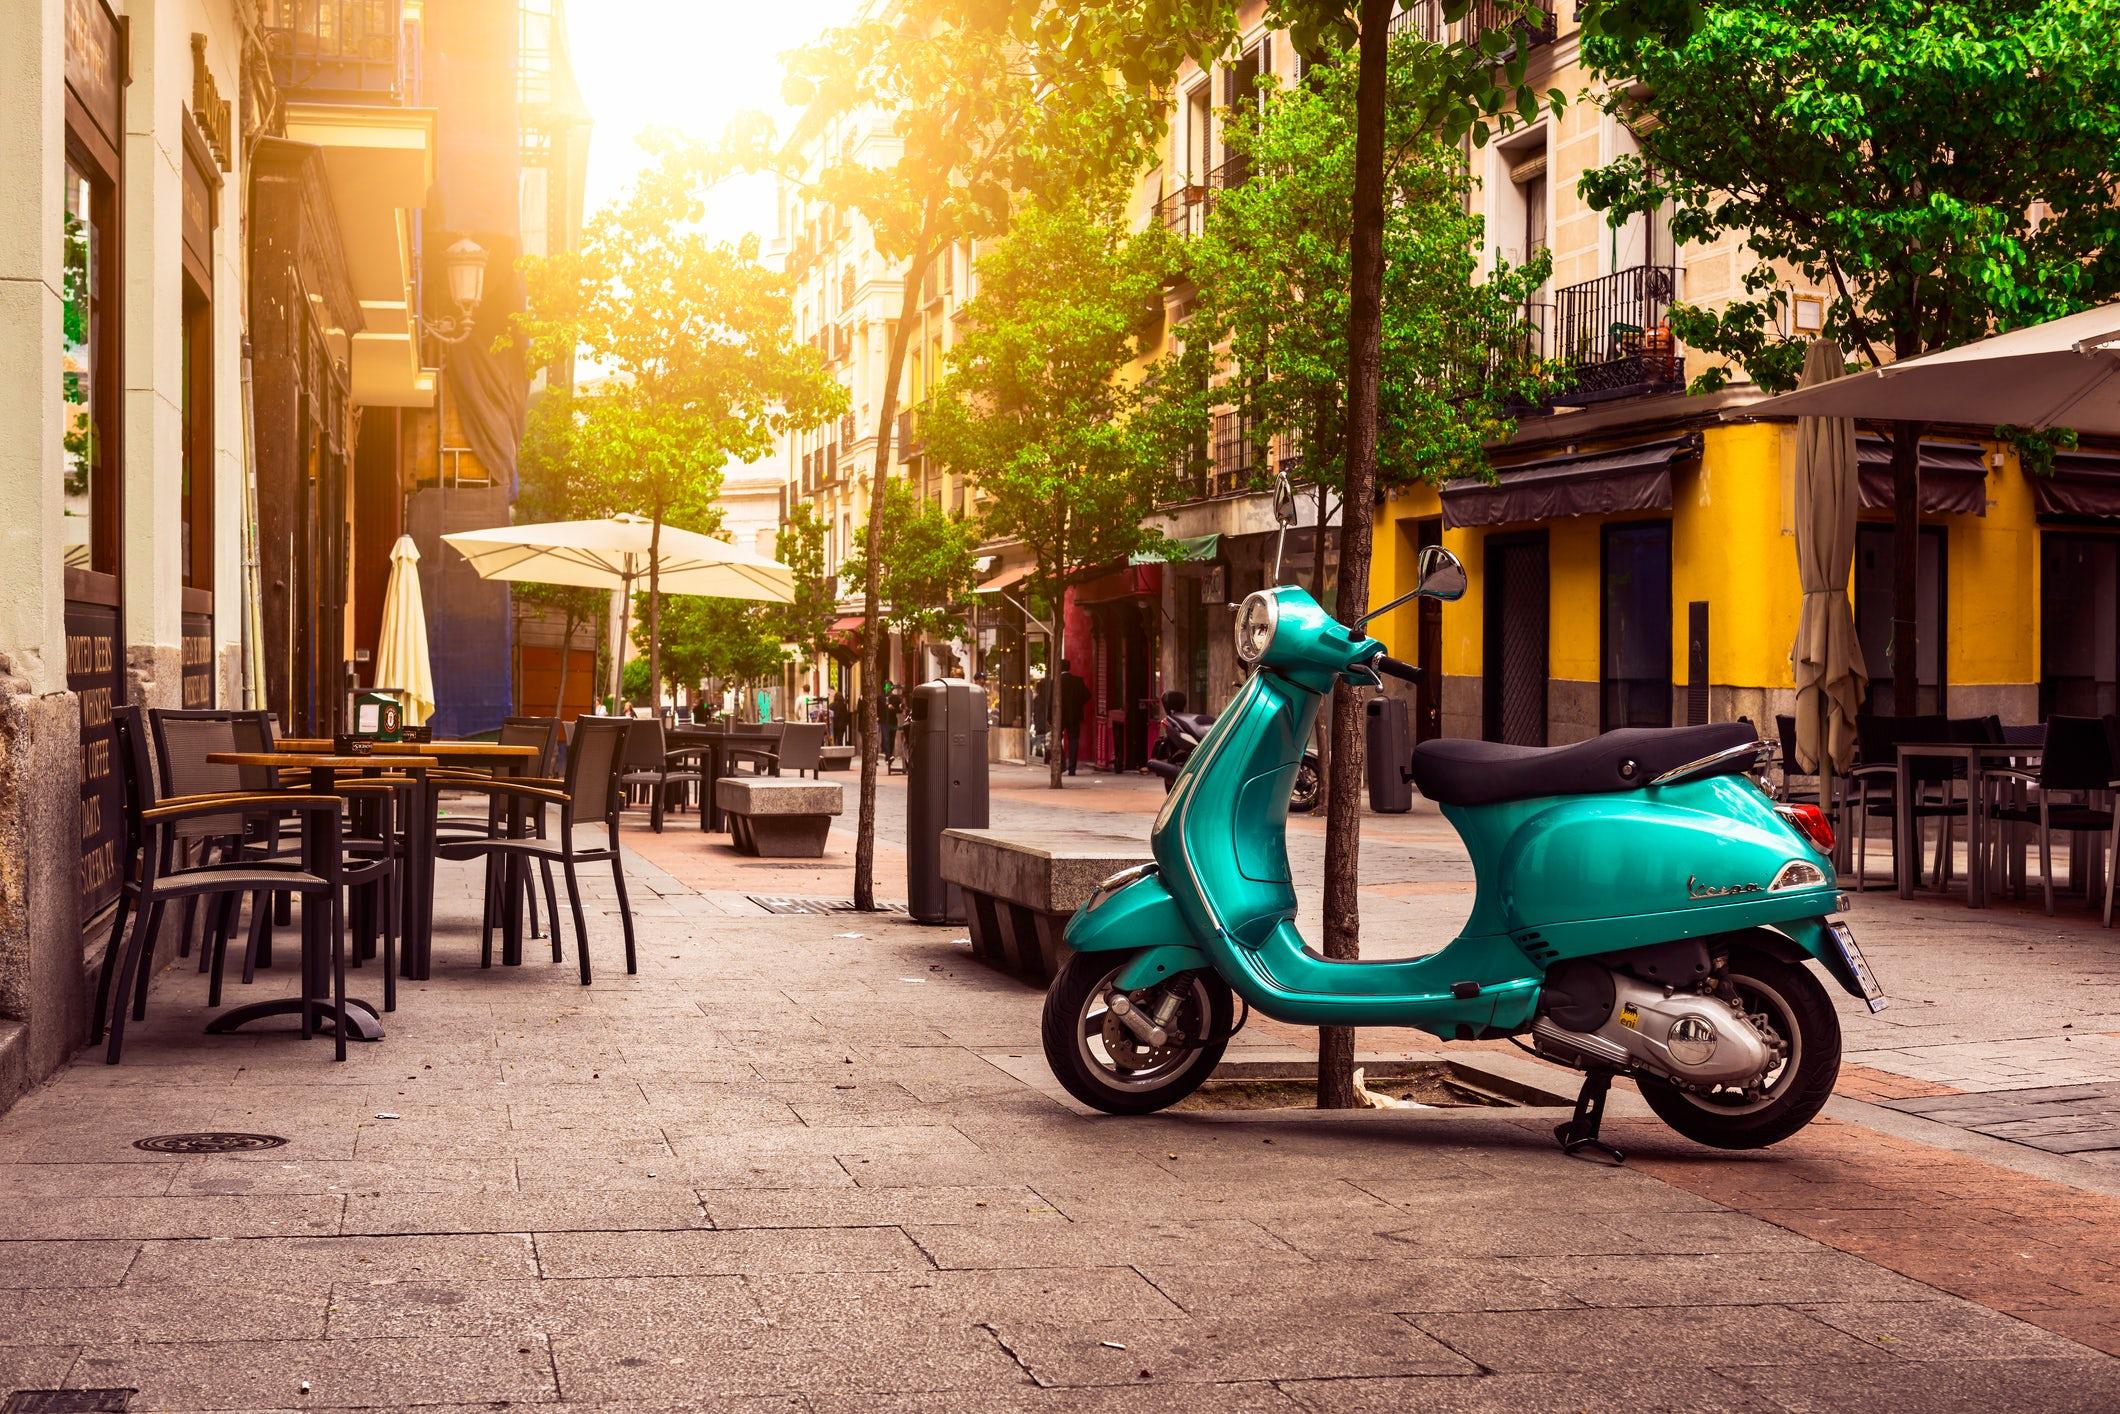 Madrid's barrios (neighborhoods)